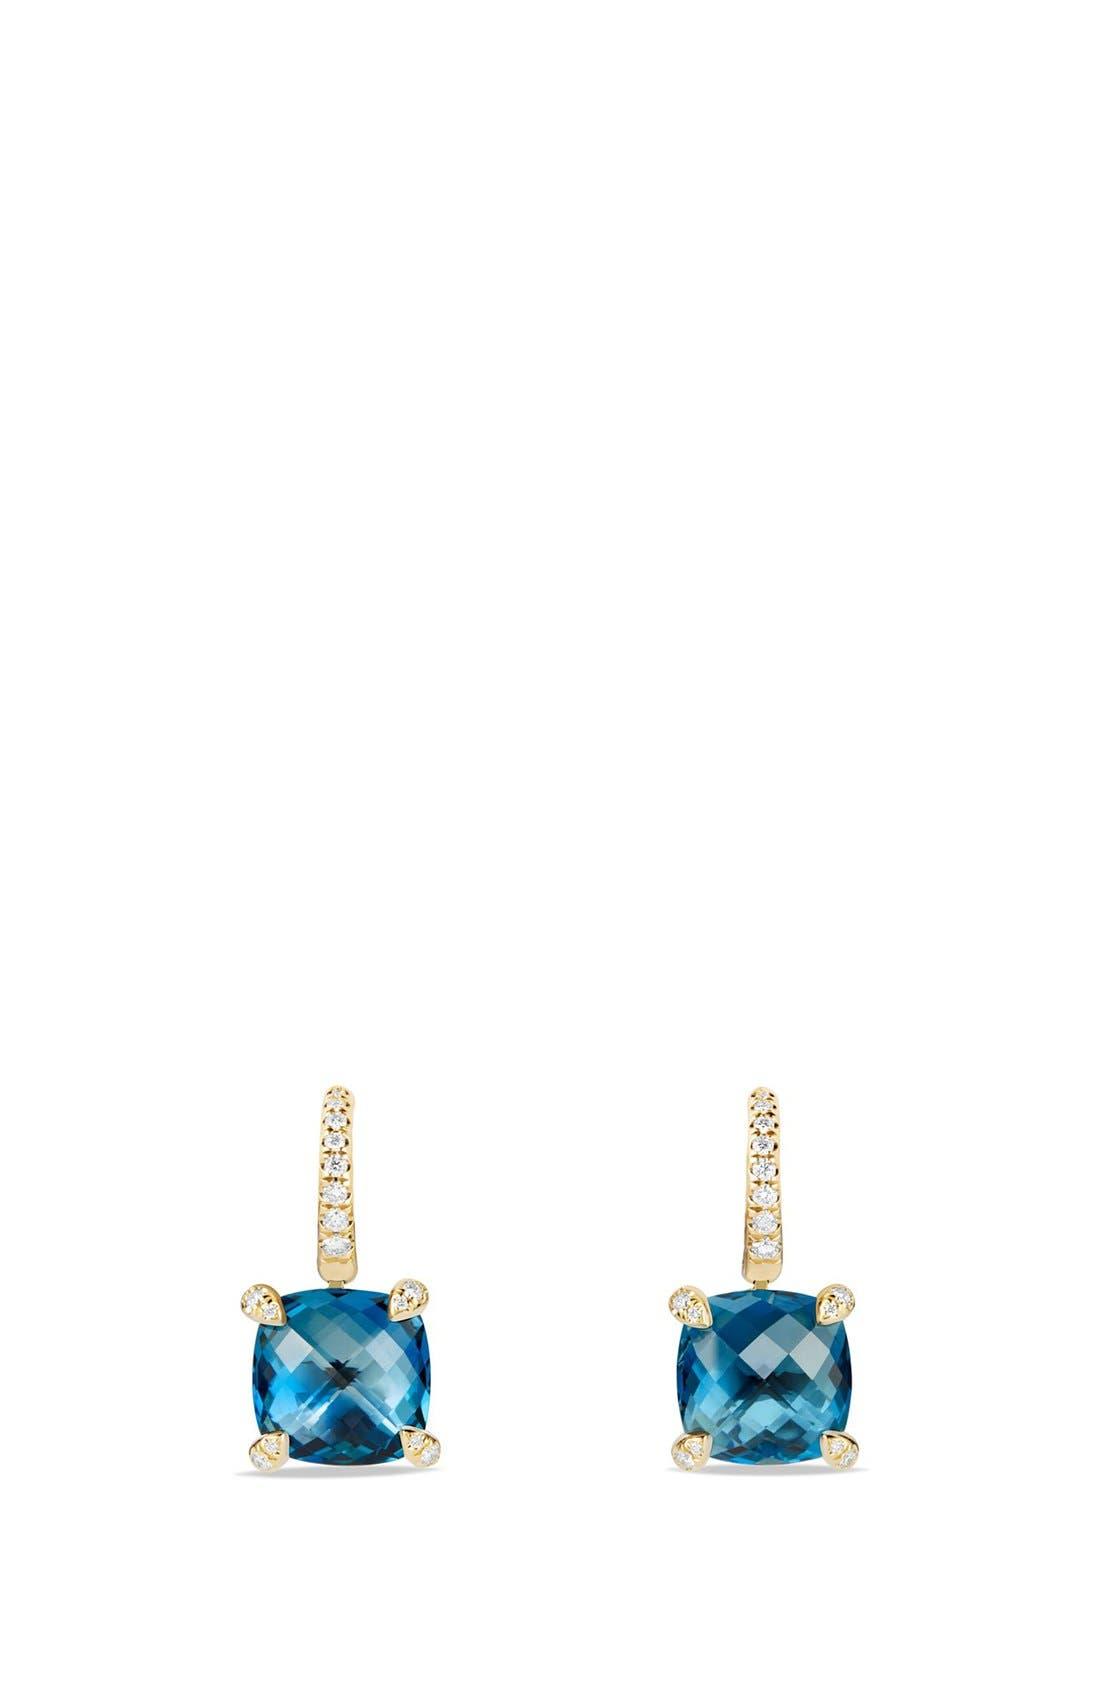 DAVID YURMAN Chatelaine Hampton Blue Topaz and Diamonds in 18K Gold